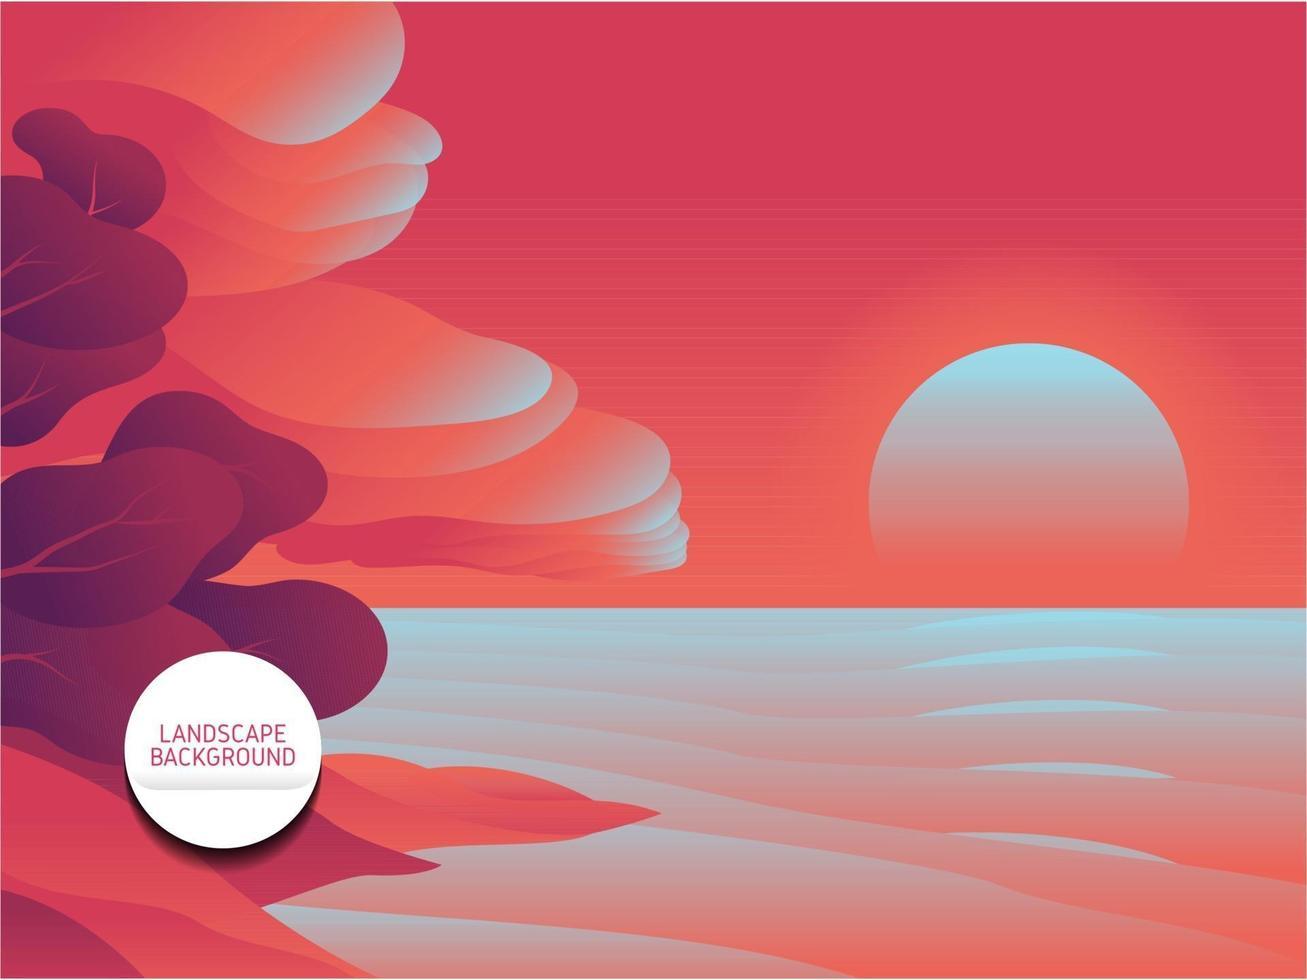 rosa landskap bakgrund vektor